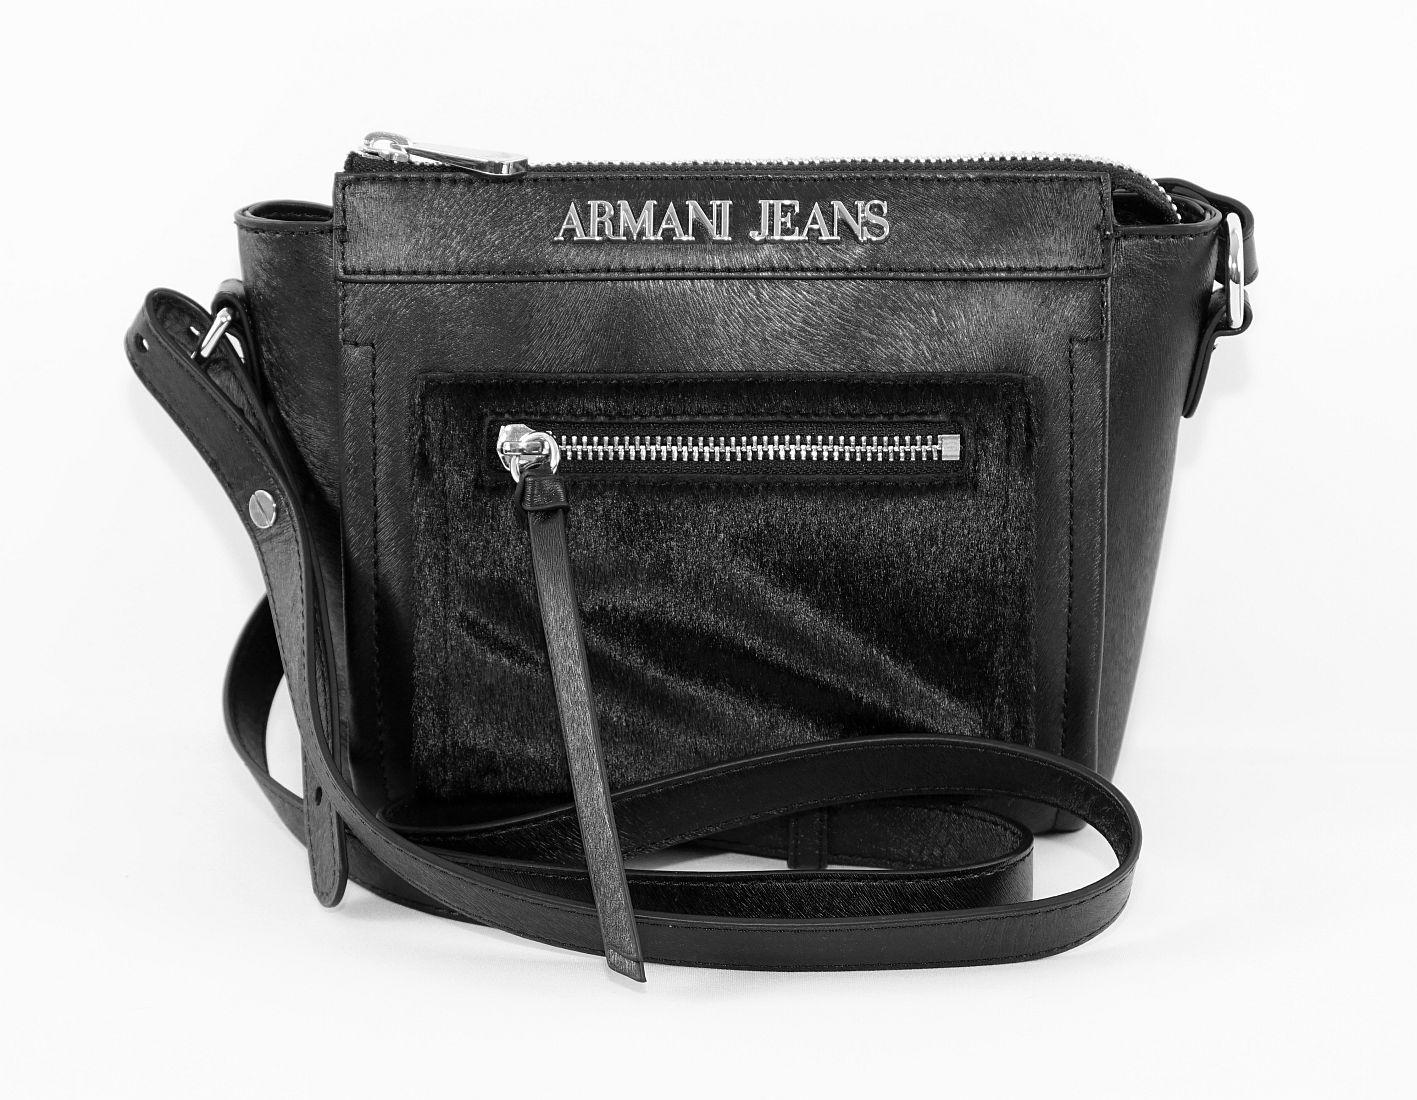 Armani Jeans Handtasche Shopper Tasche WOMEN'S SLING BAG 922104 6A728 00020 Nero HW16-1